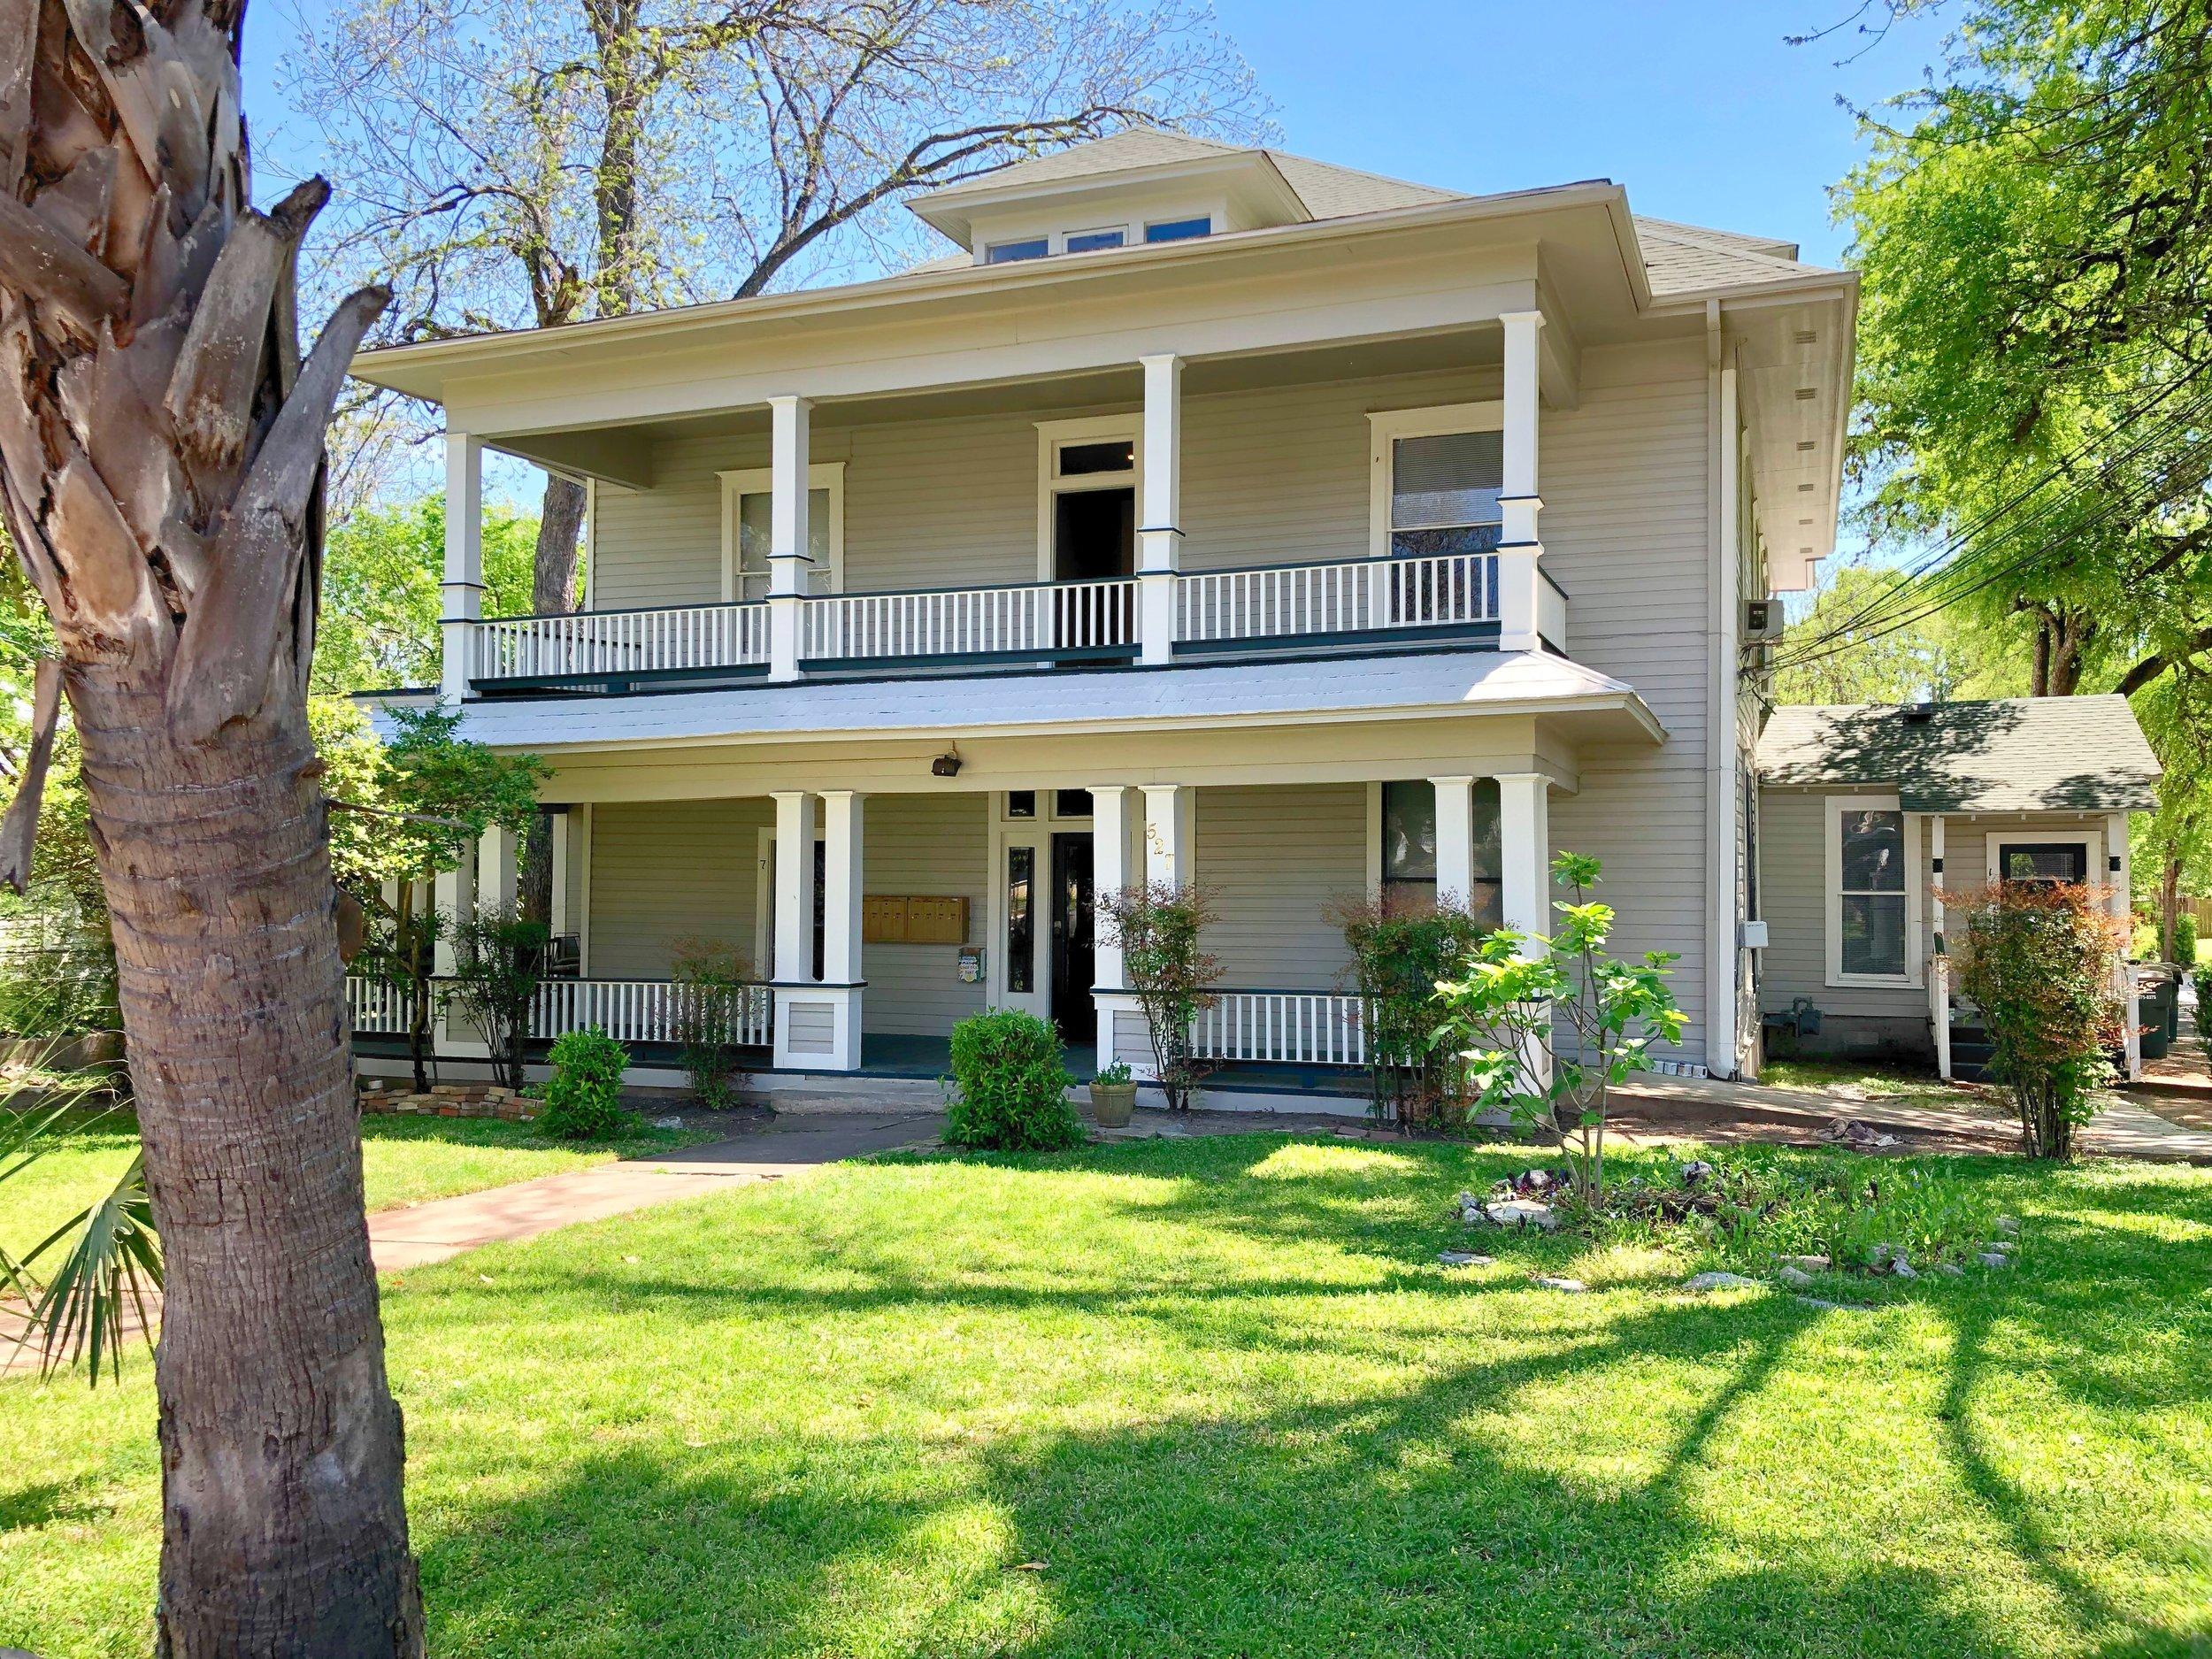 Apartments for Rent | San Marcos, TX Vance J  Elliott Realty group